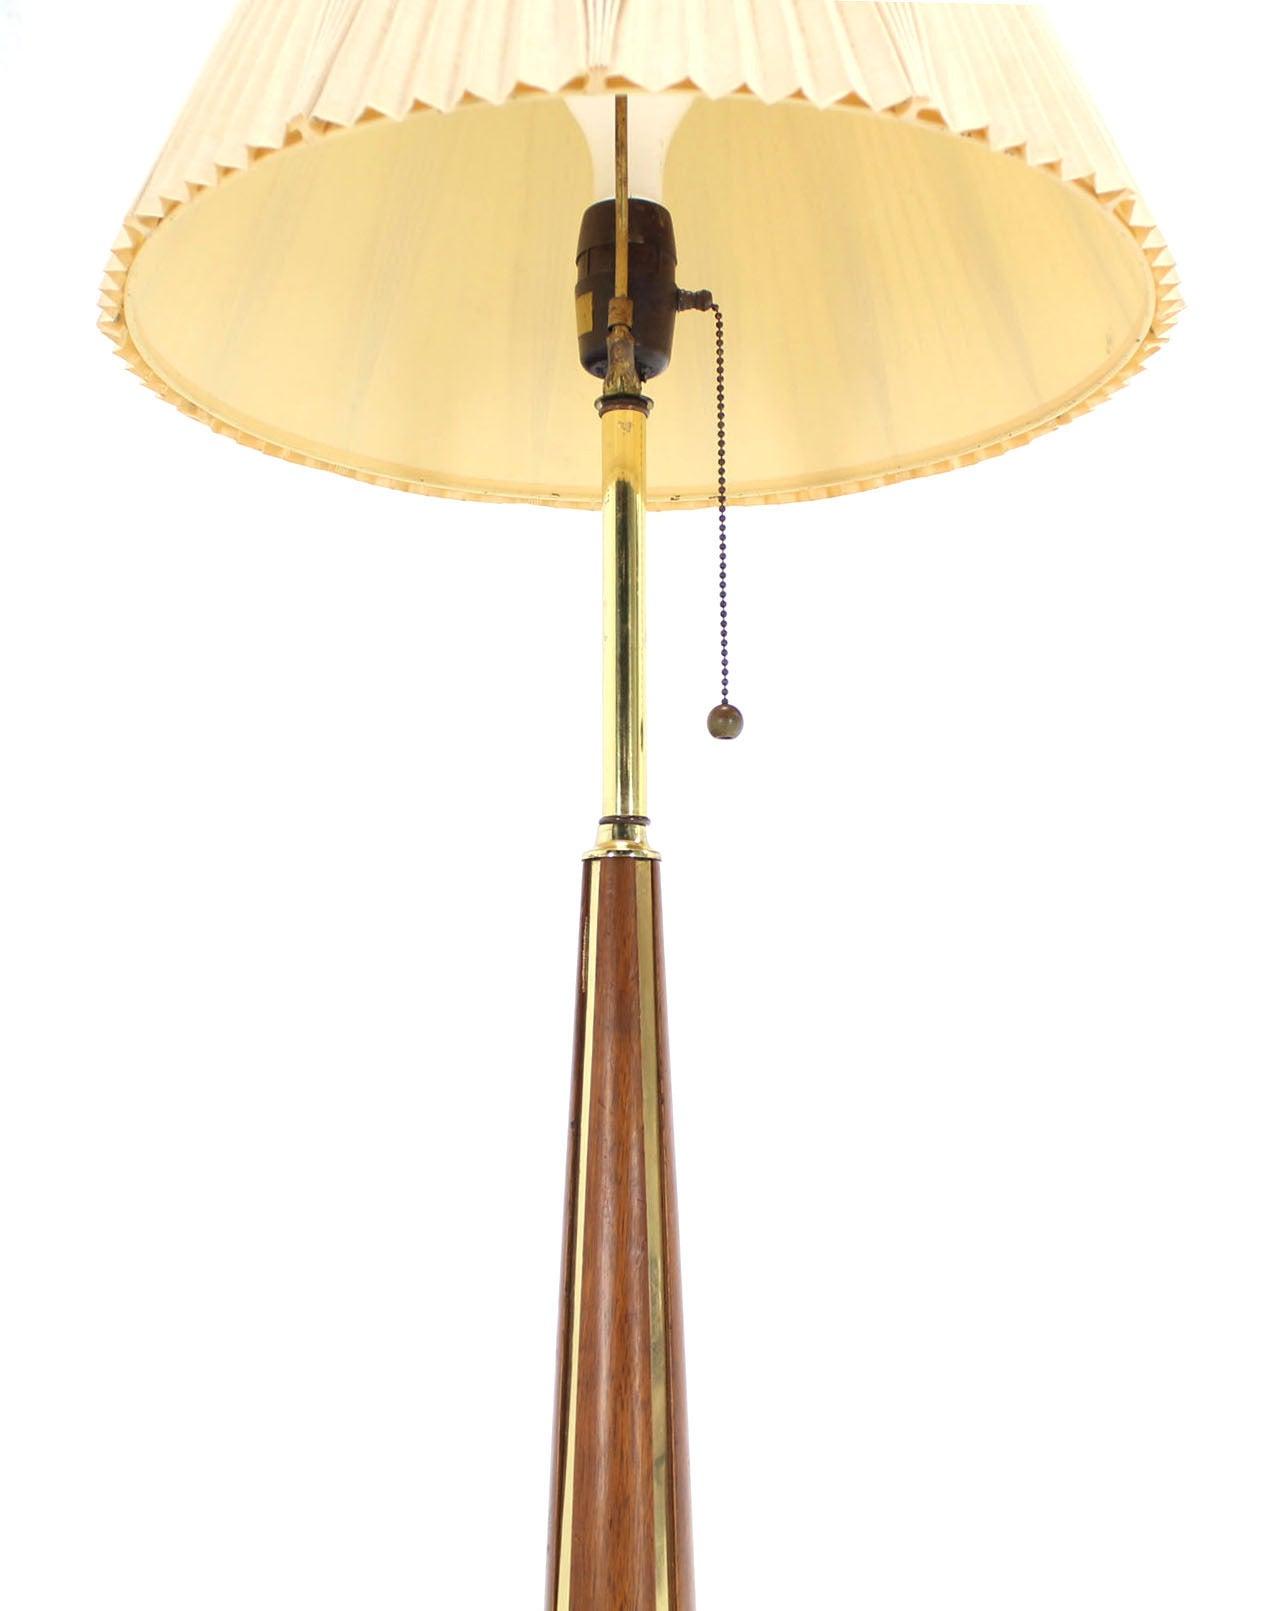 walnut and brass mid century modern floor lamp at 1stdibs. Black Bedroom Furniture Sets. Home Design Ideas